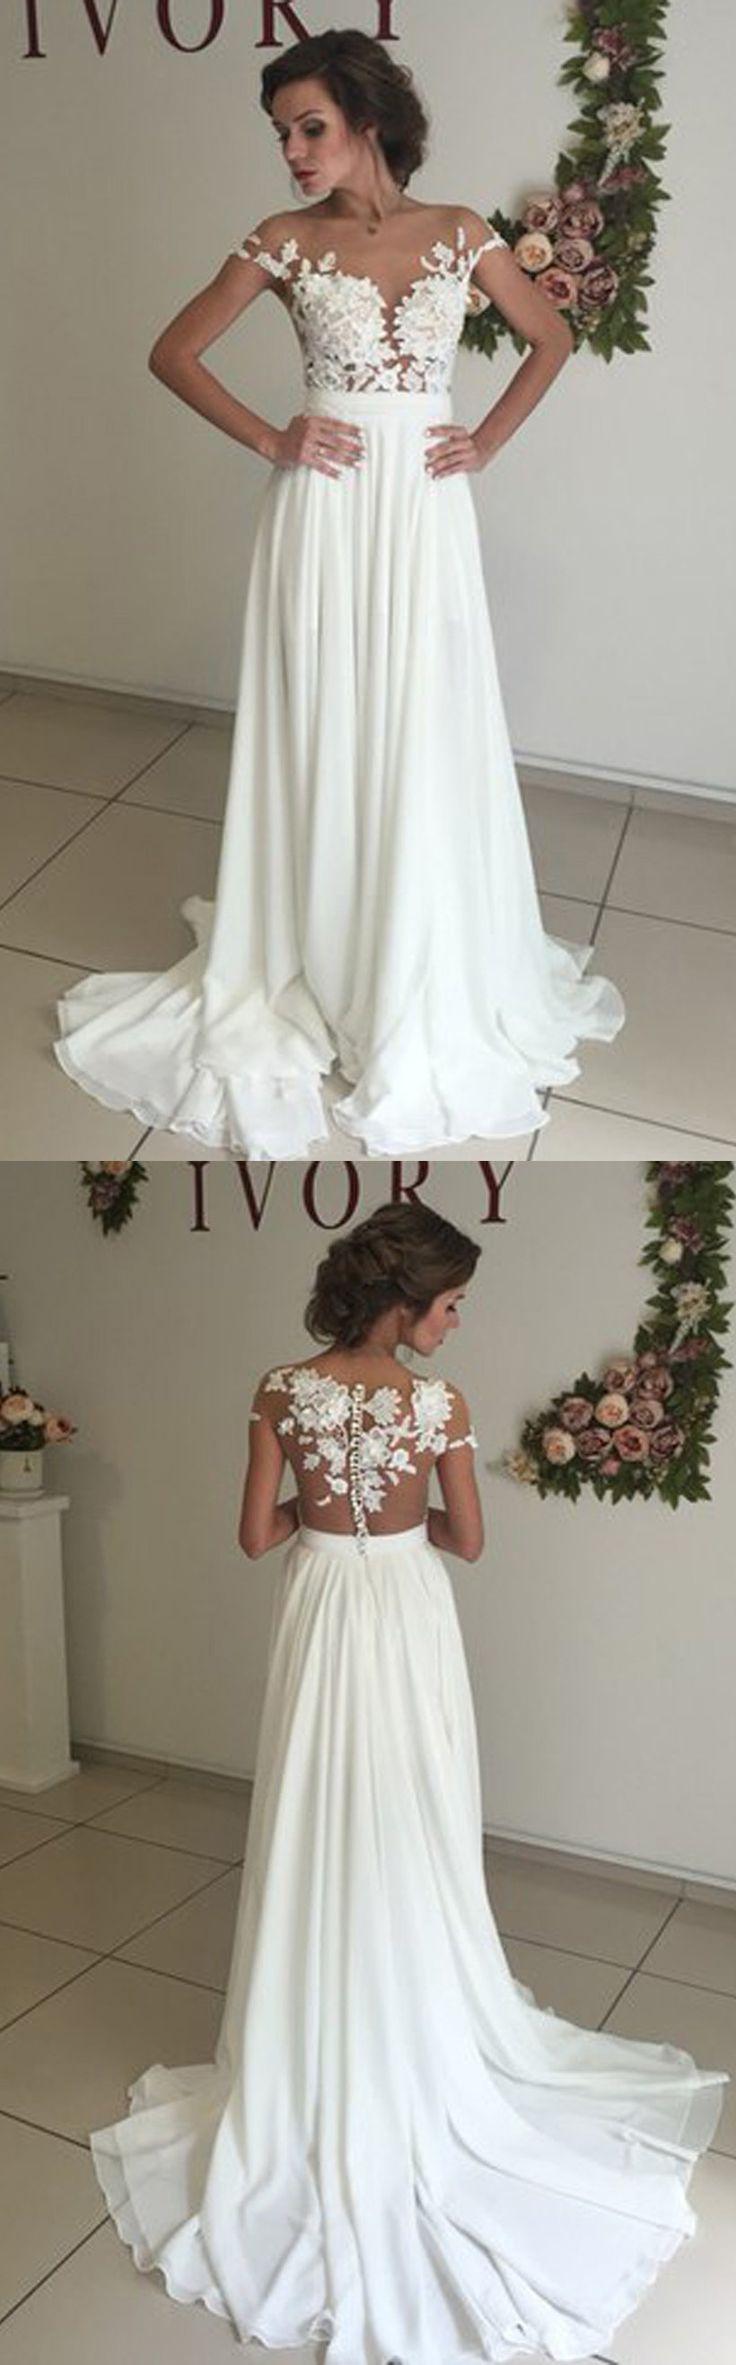 wedding dresses white wedding dress Elegant Wedding Dresses White Wedd